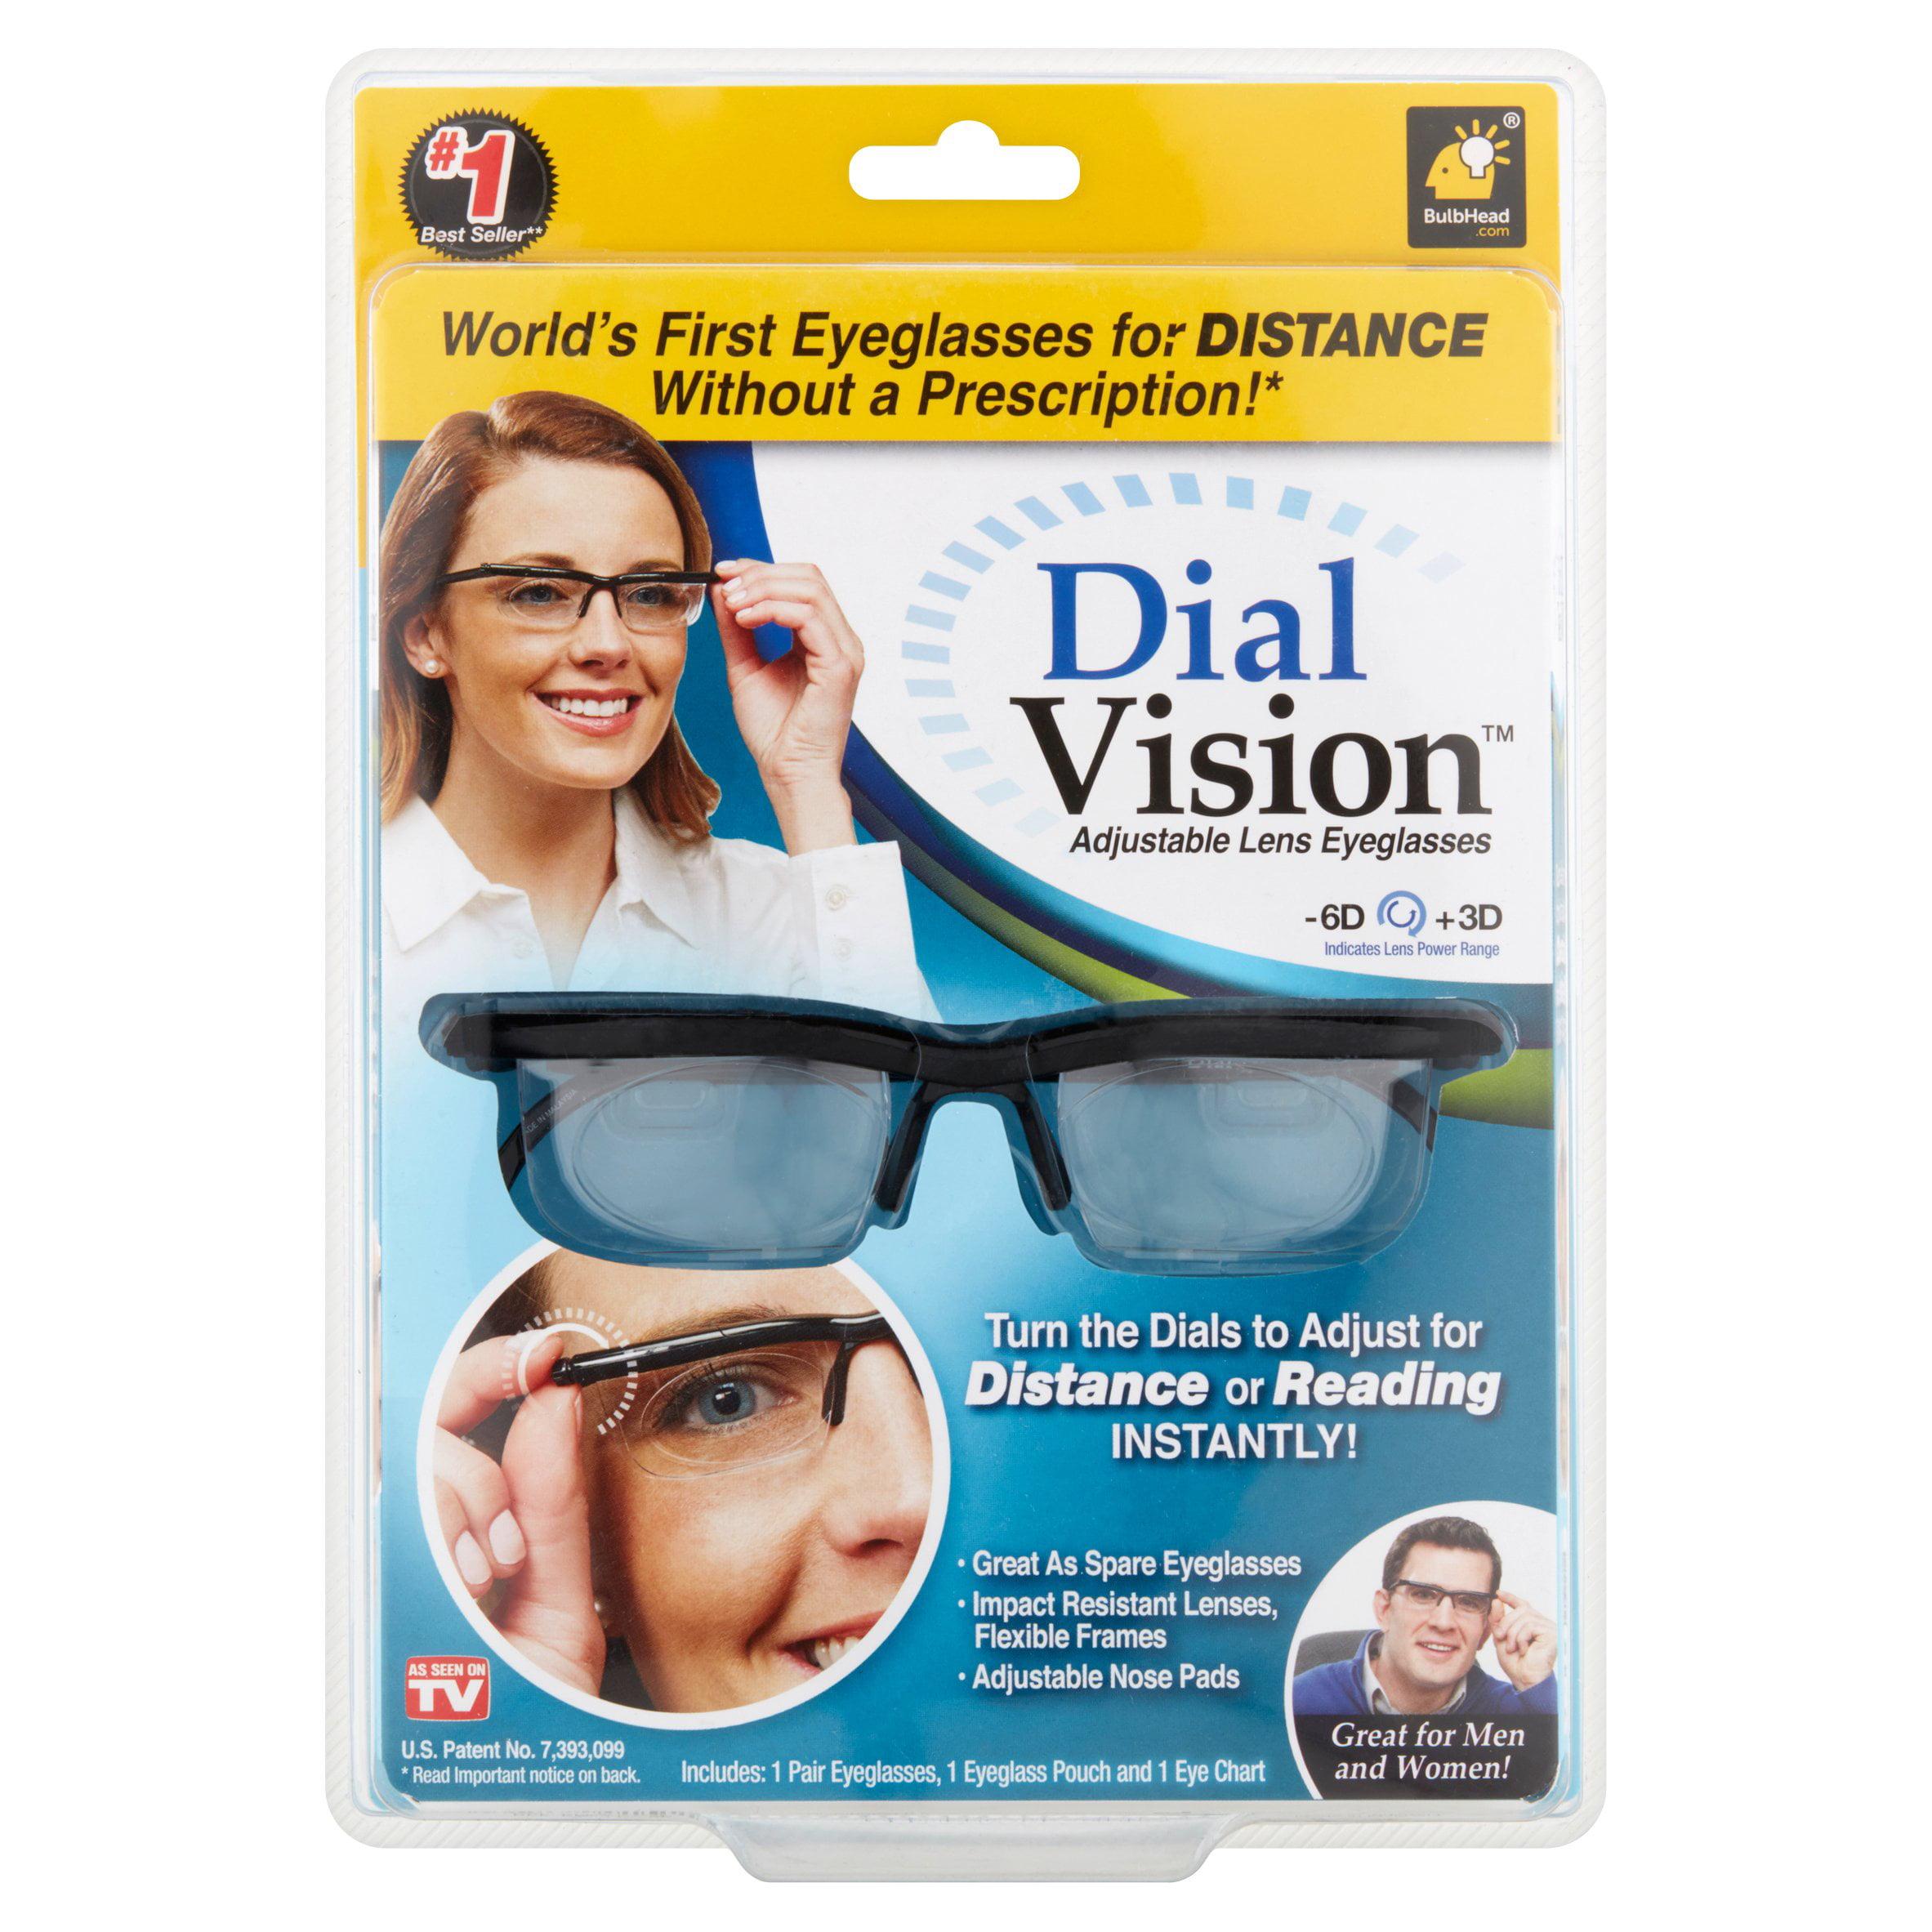 As Seen On Tv Dial Vision Adjustable Vision Eyeglasses Walmart